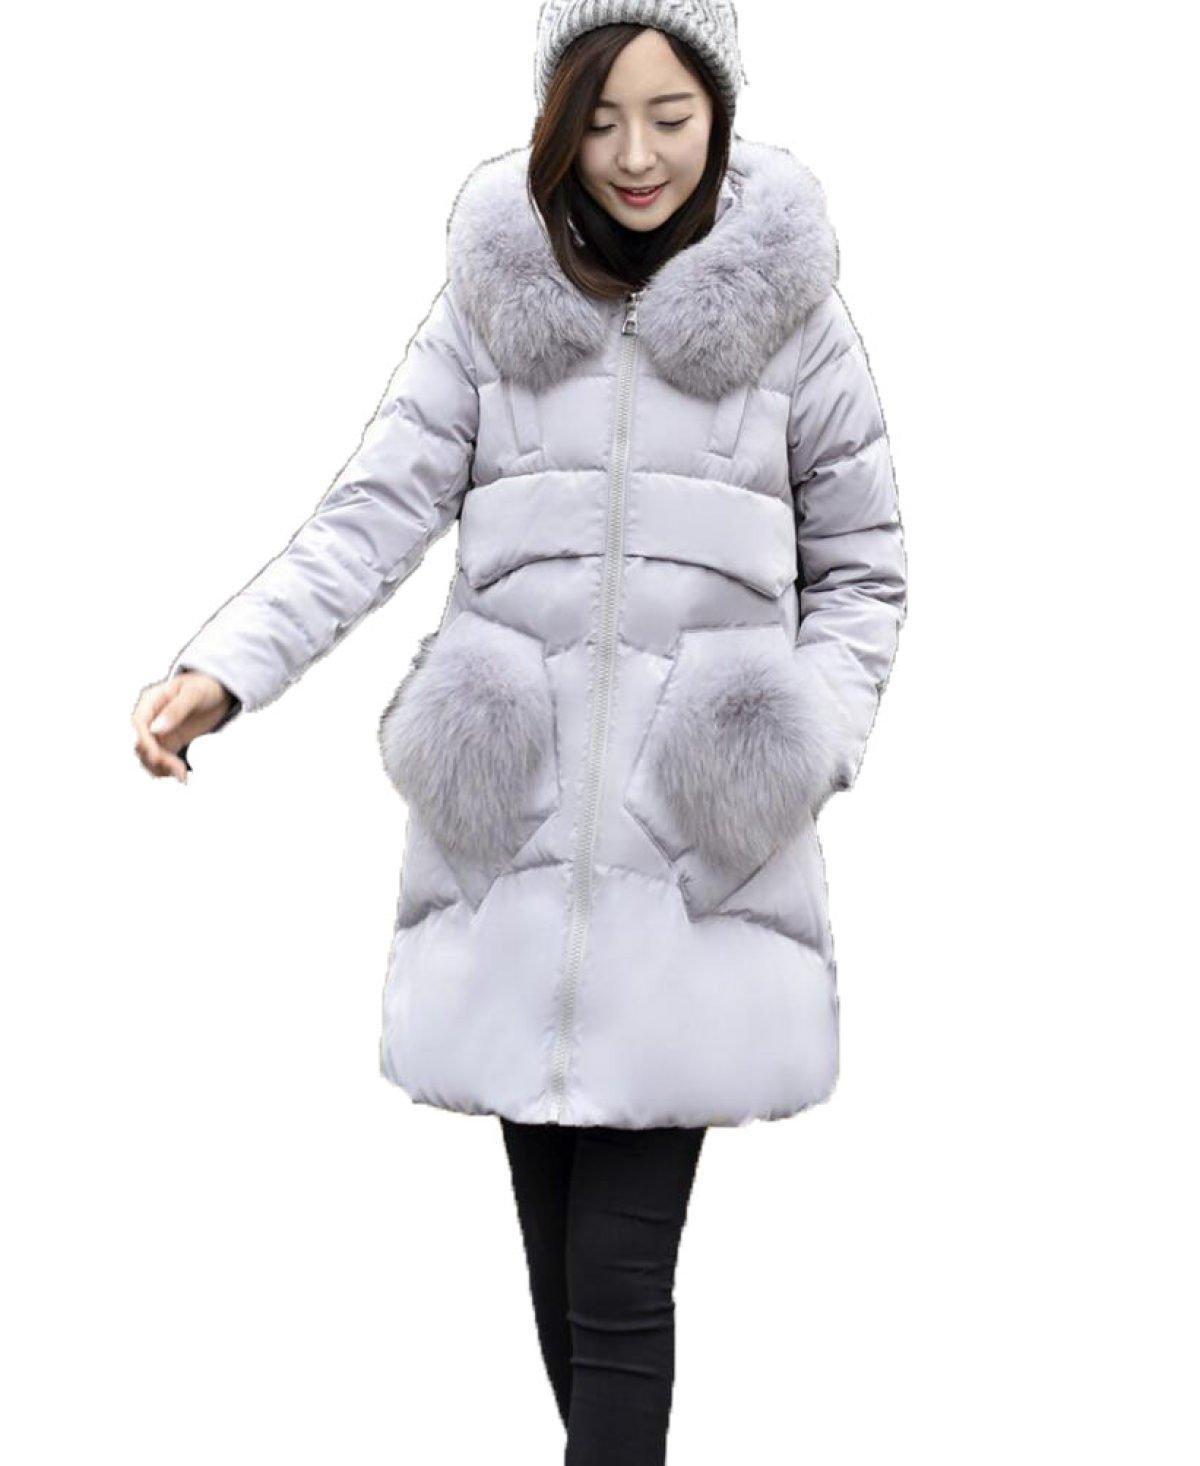 LQABW New Down Jacket Mujeres Puffa Quilted Coat Ocio Moda Mediados De Longitud